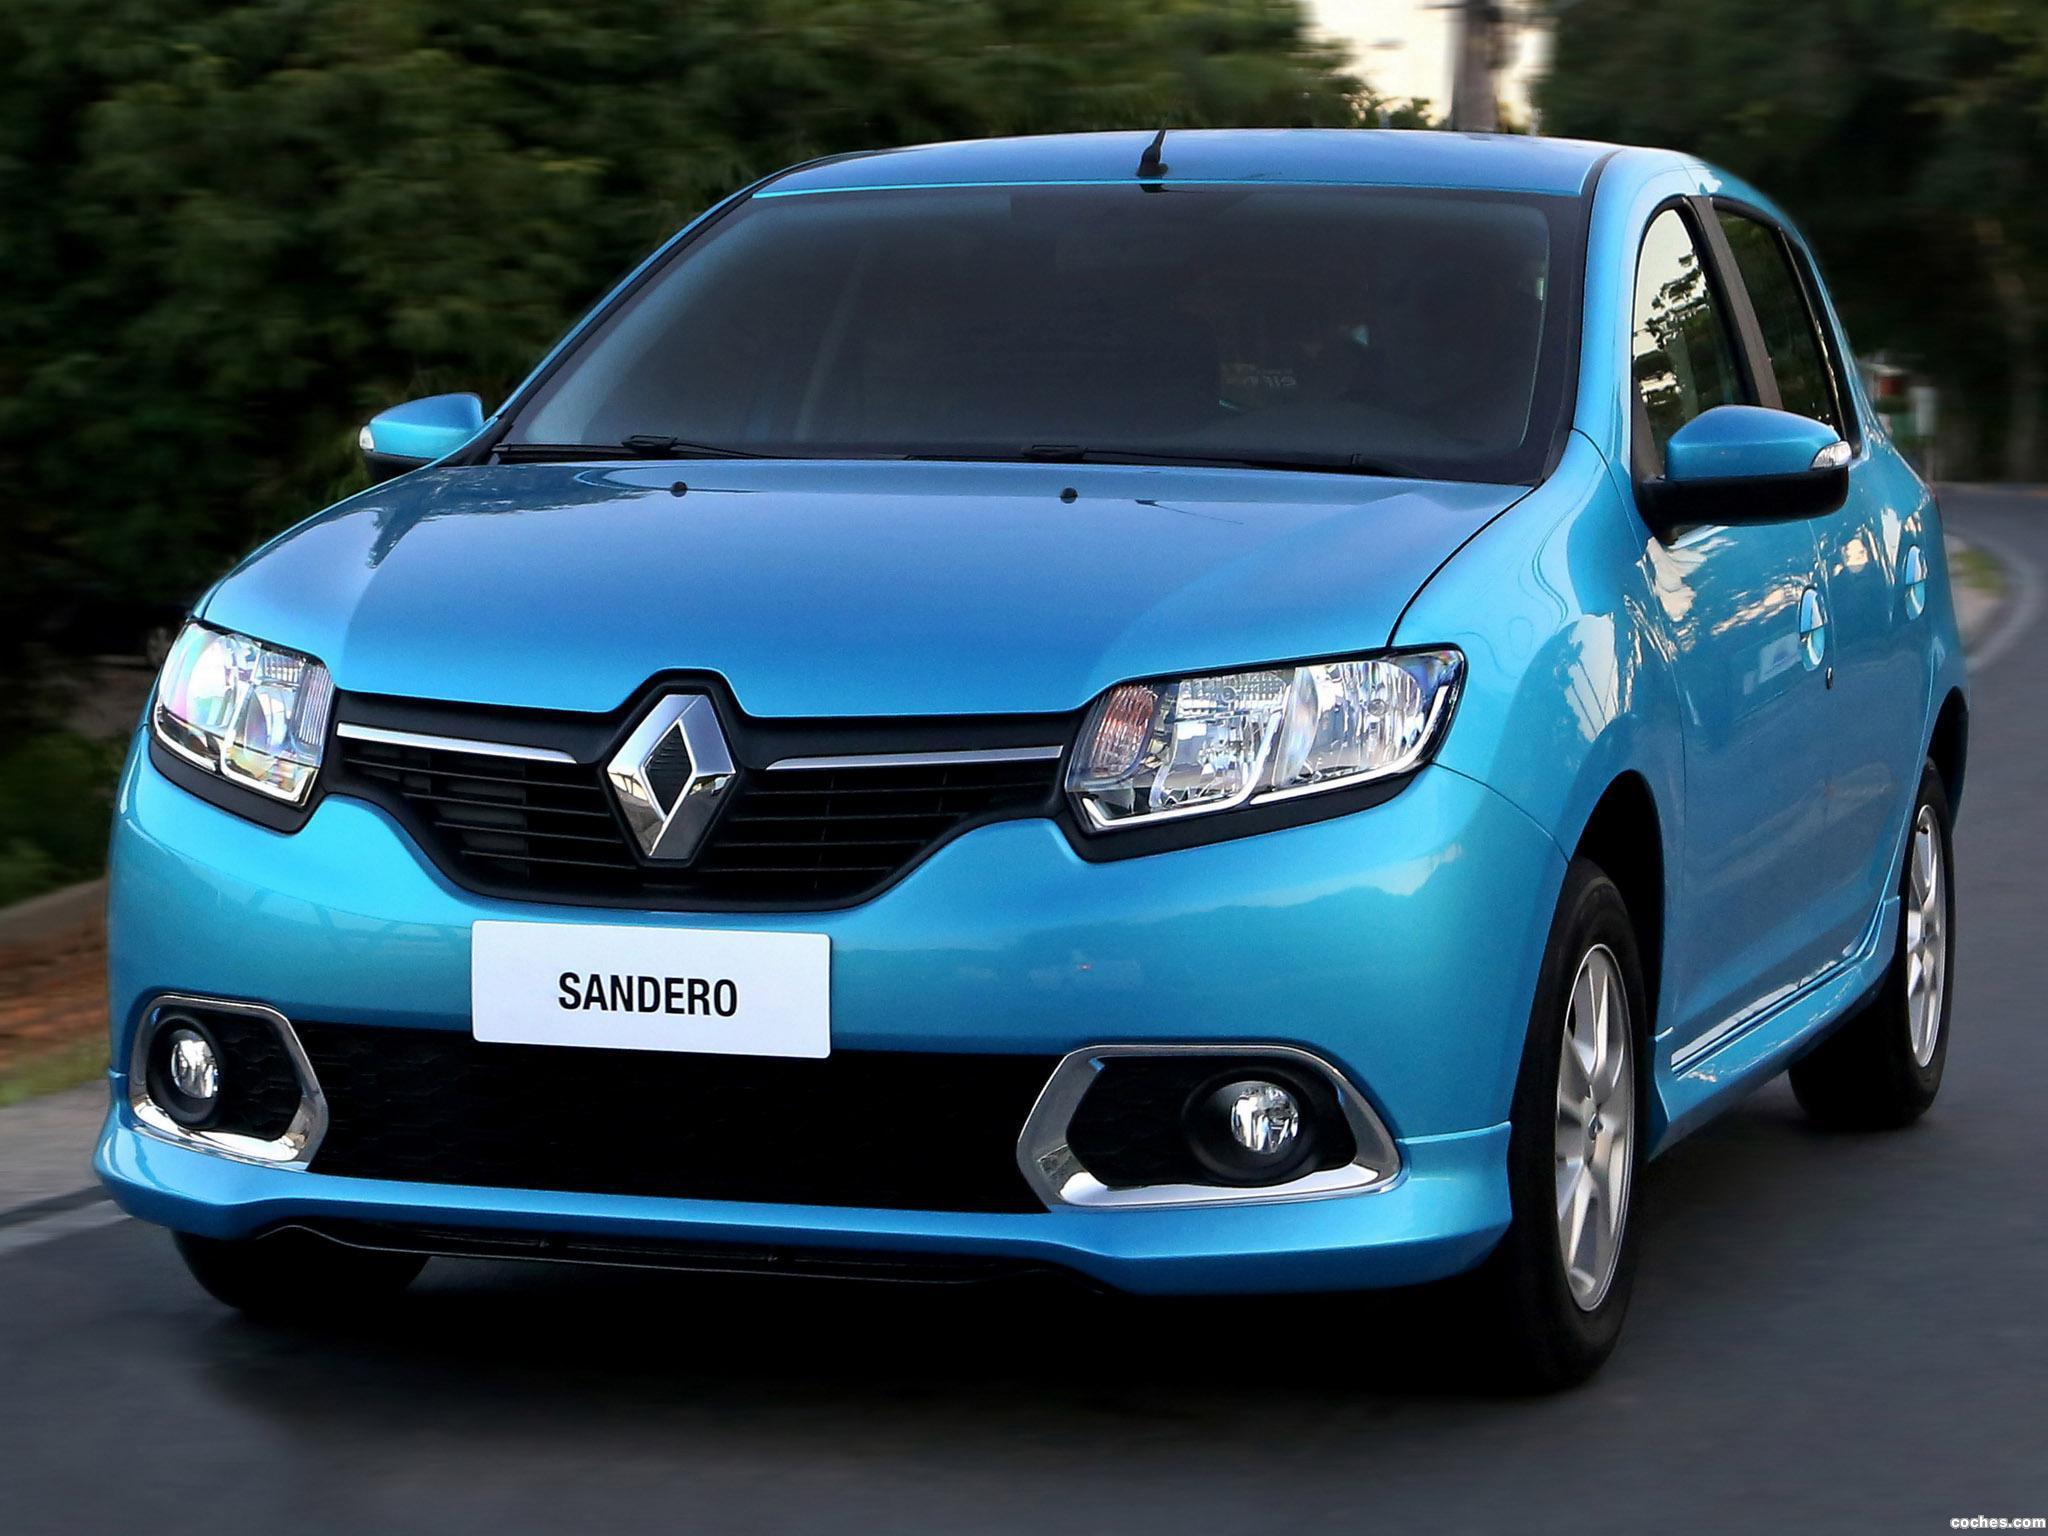 Foto 0 de Renault Sandero Dynamique Brasil 2014